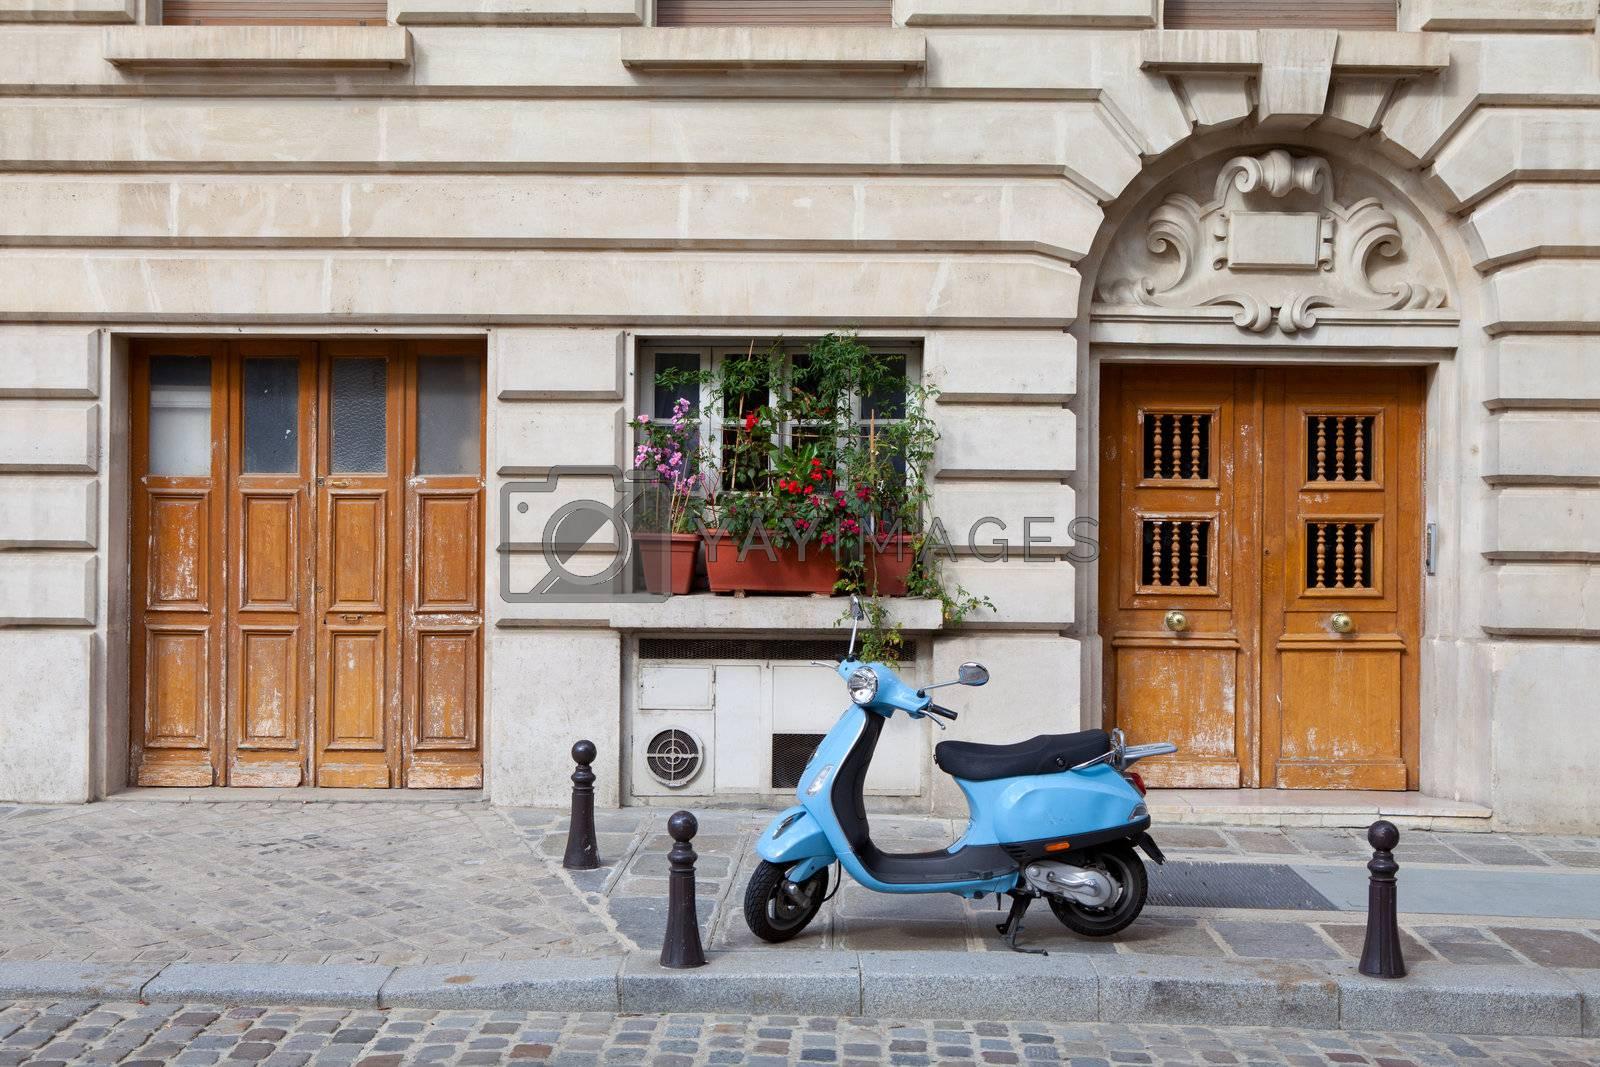 Blue retro moped parked near house on European cobblestone stree by SergeyAK